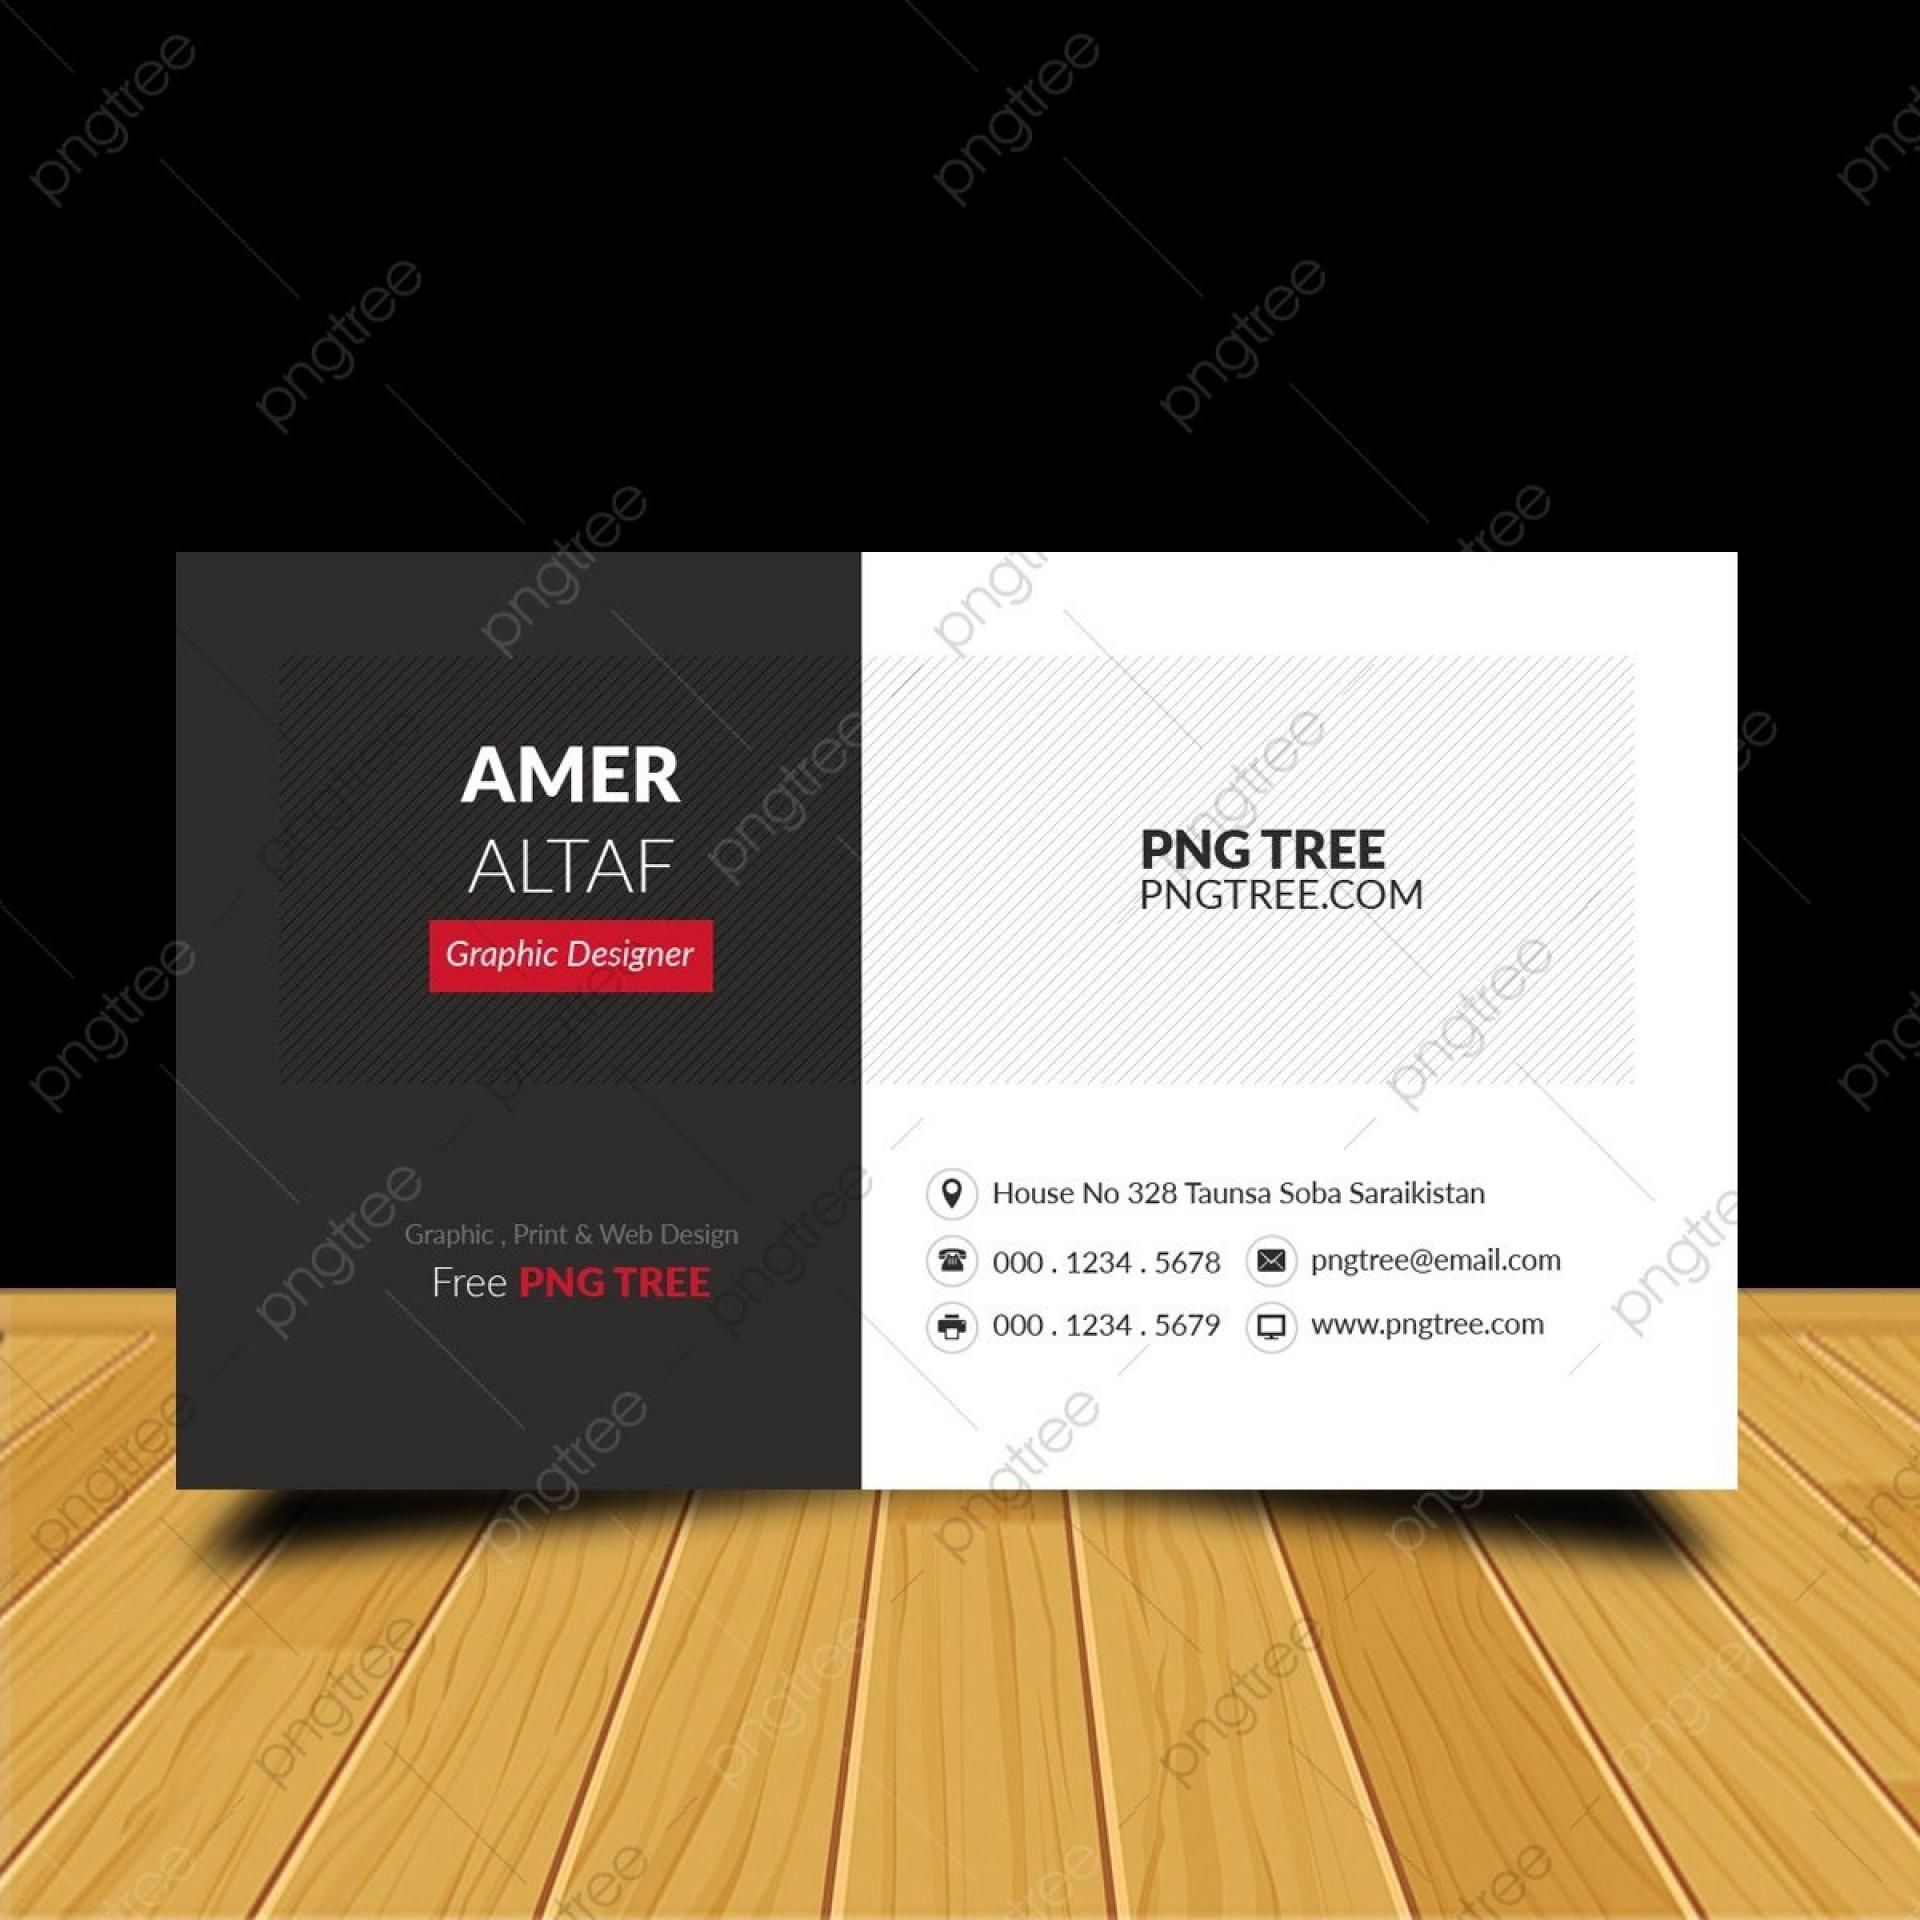 007 Surprising Simple Visiting Card Design Free Download Concept  Busines Psd Coreldraw File1920